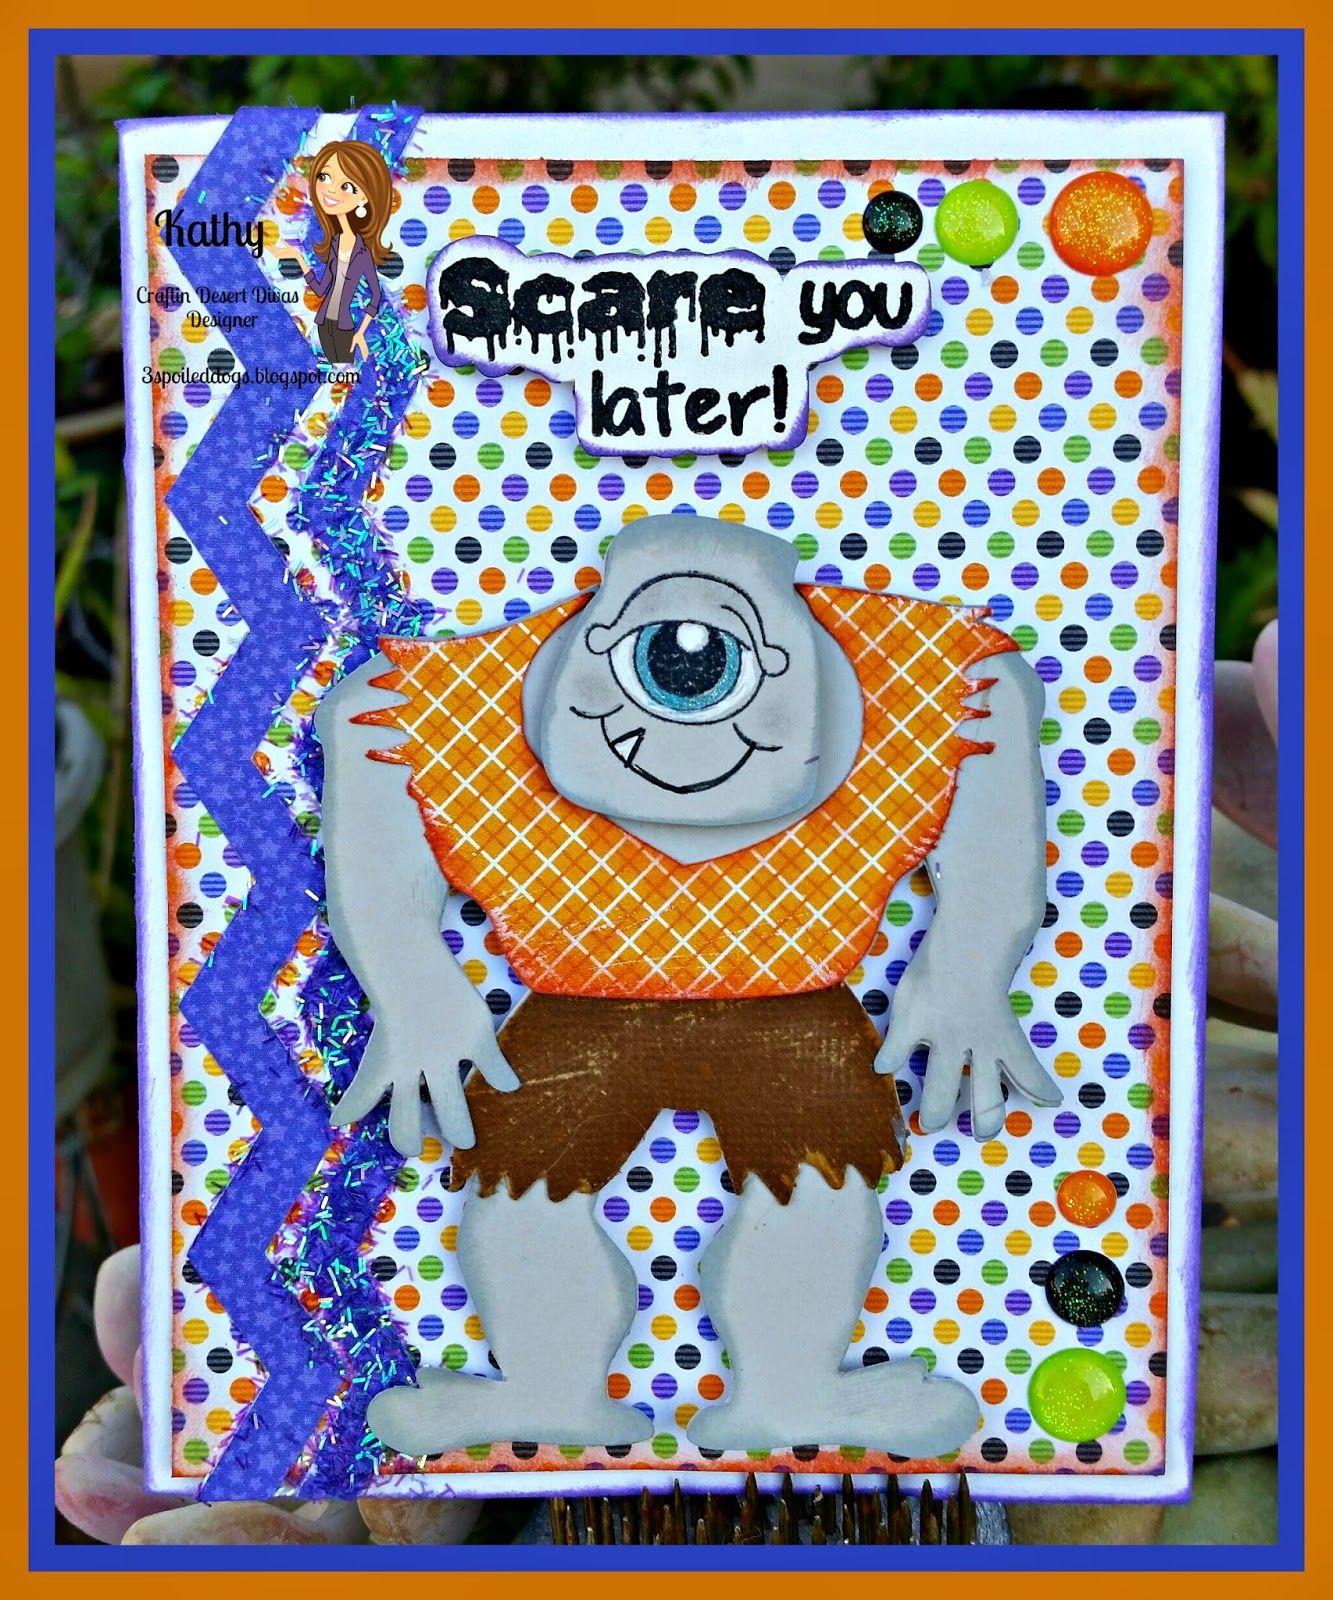 CDD Stamps Ghostly Greetings, Kadoodle Bug Designs, Peachy Keen Stamps, Doodlebug